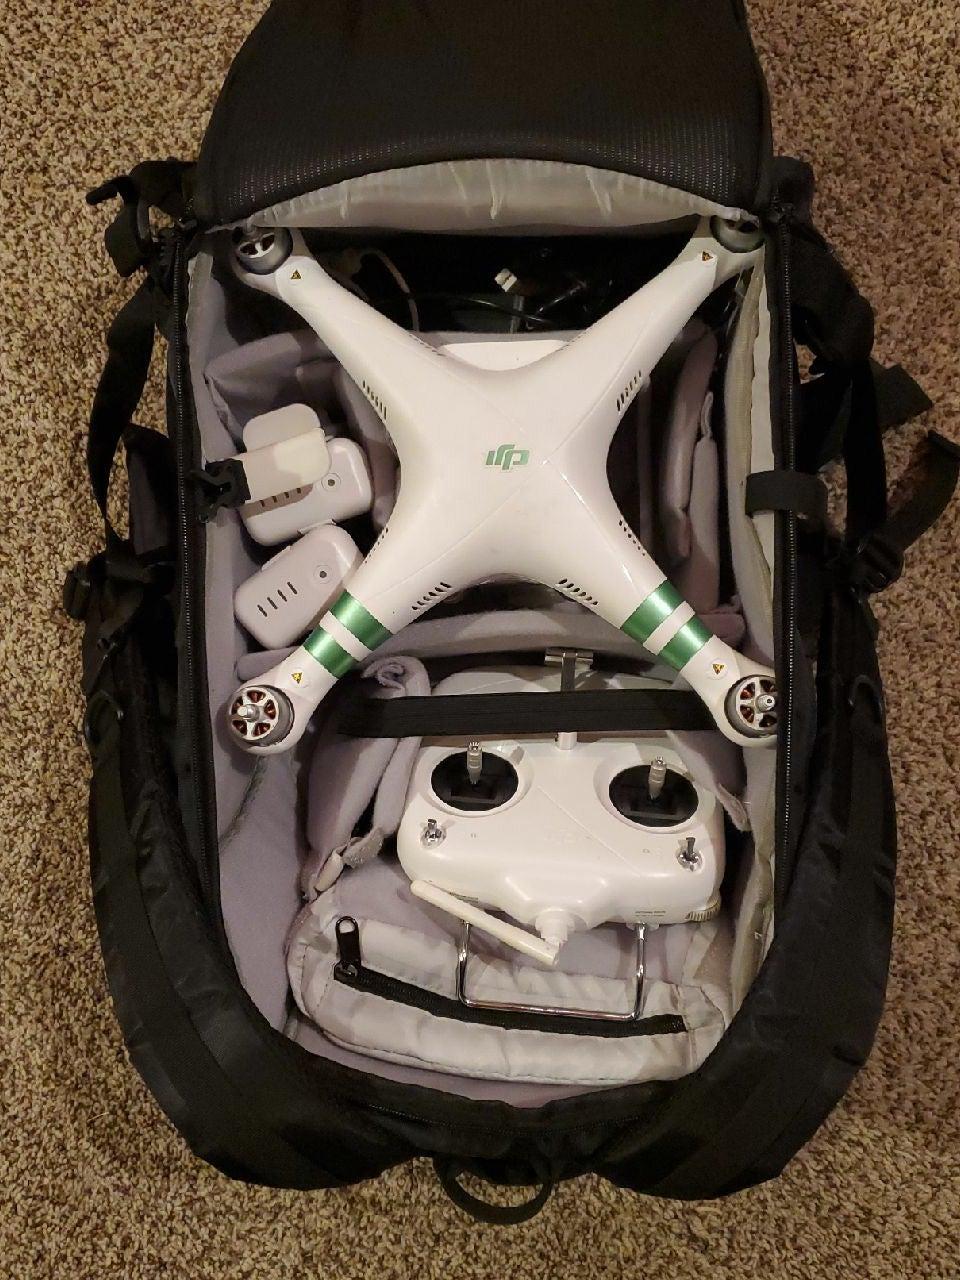 DJI Phantom 3 Standard drone with access